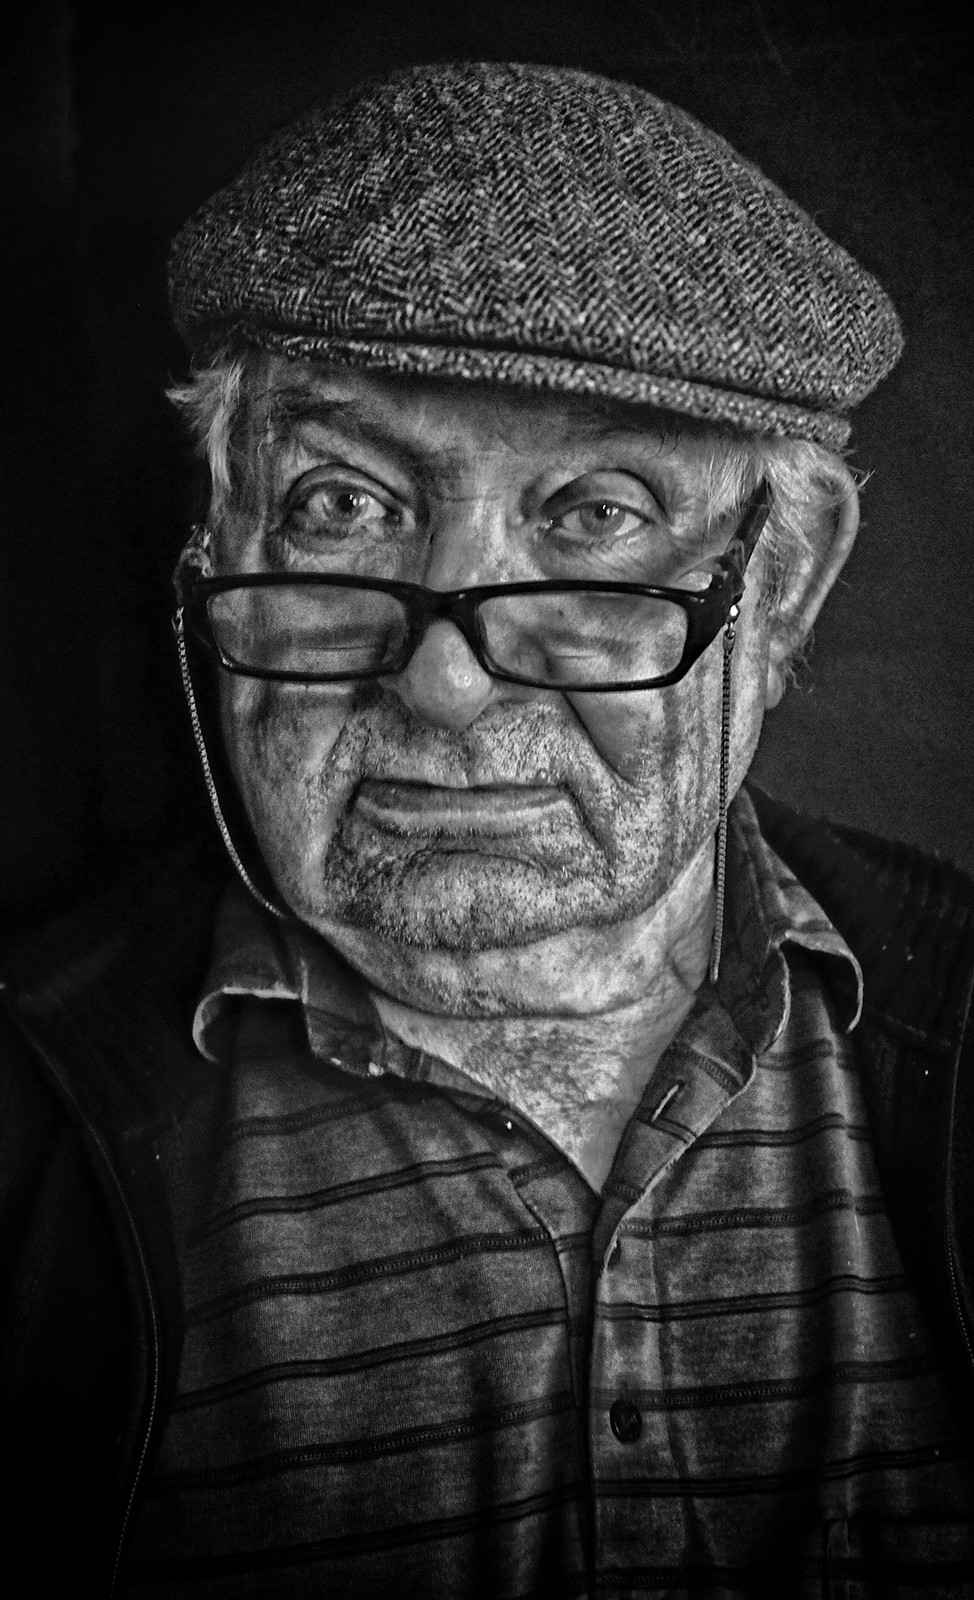 'Our John' by Jim Devlin (11 marks)  -  Strabane & District Camera Club